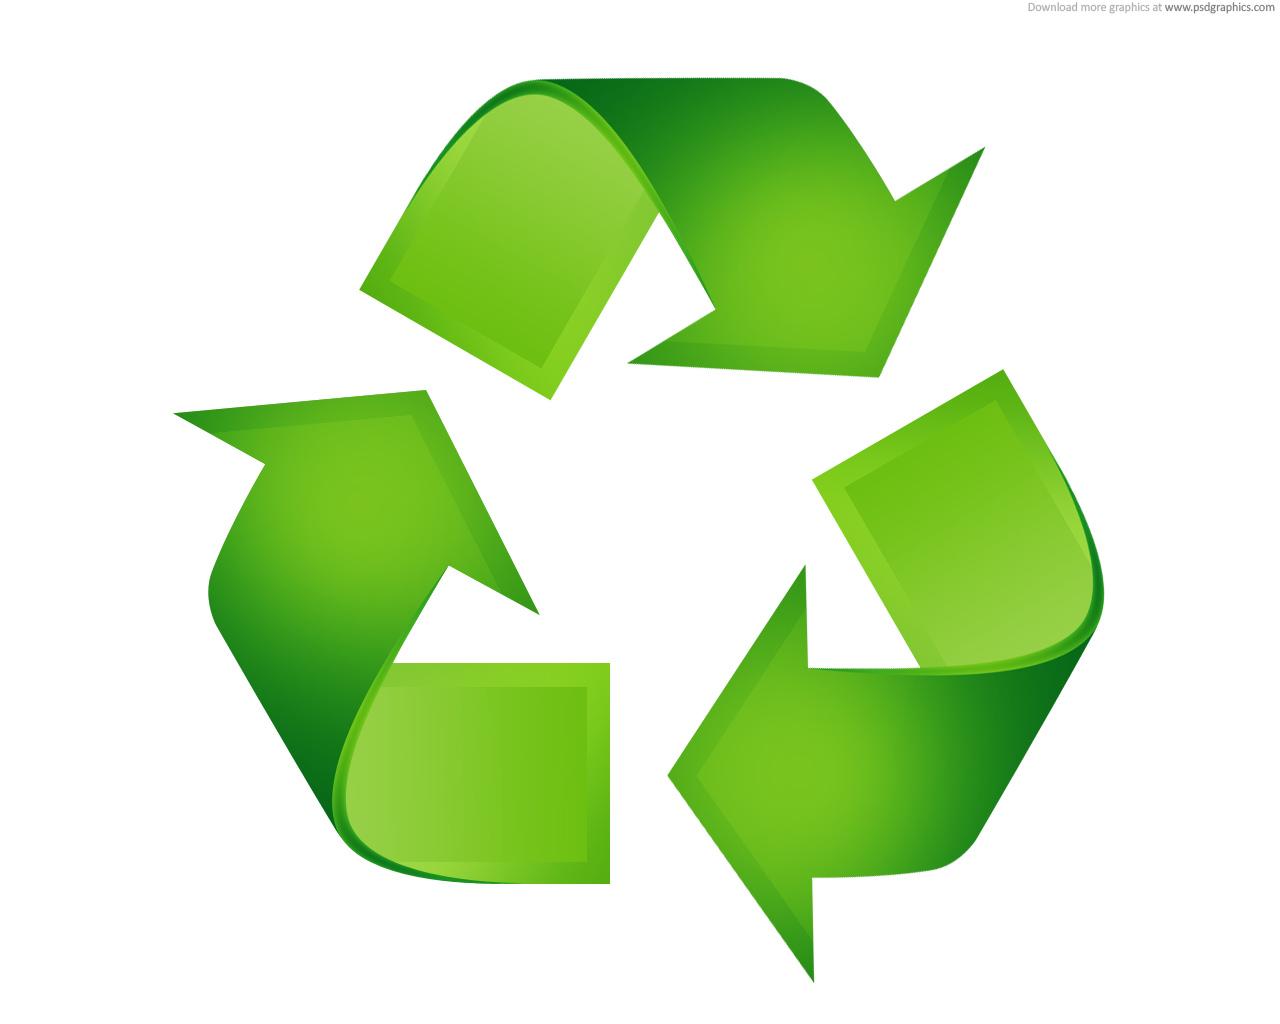 green-recycling-symbol.jpg